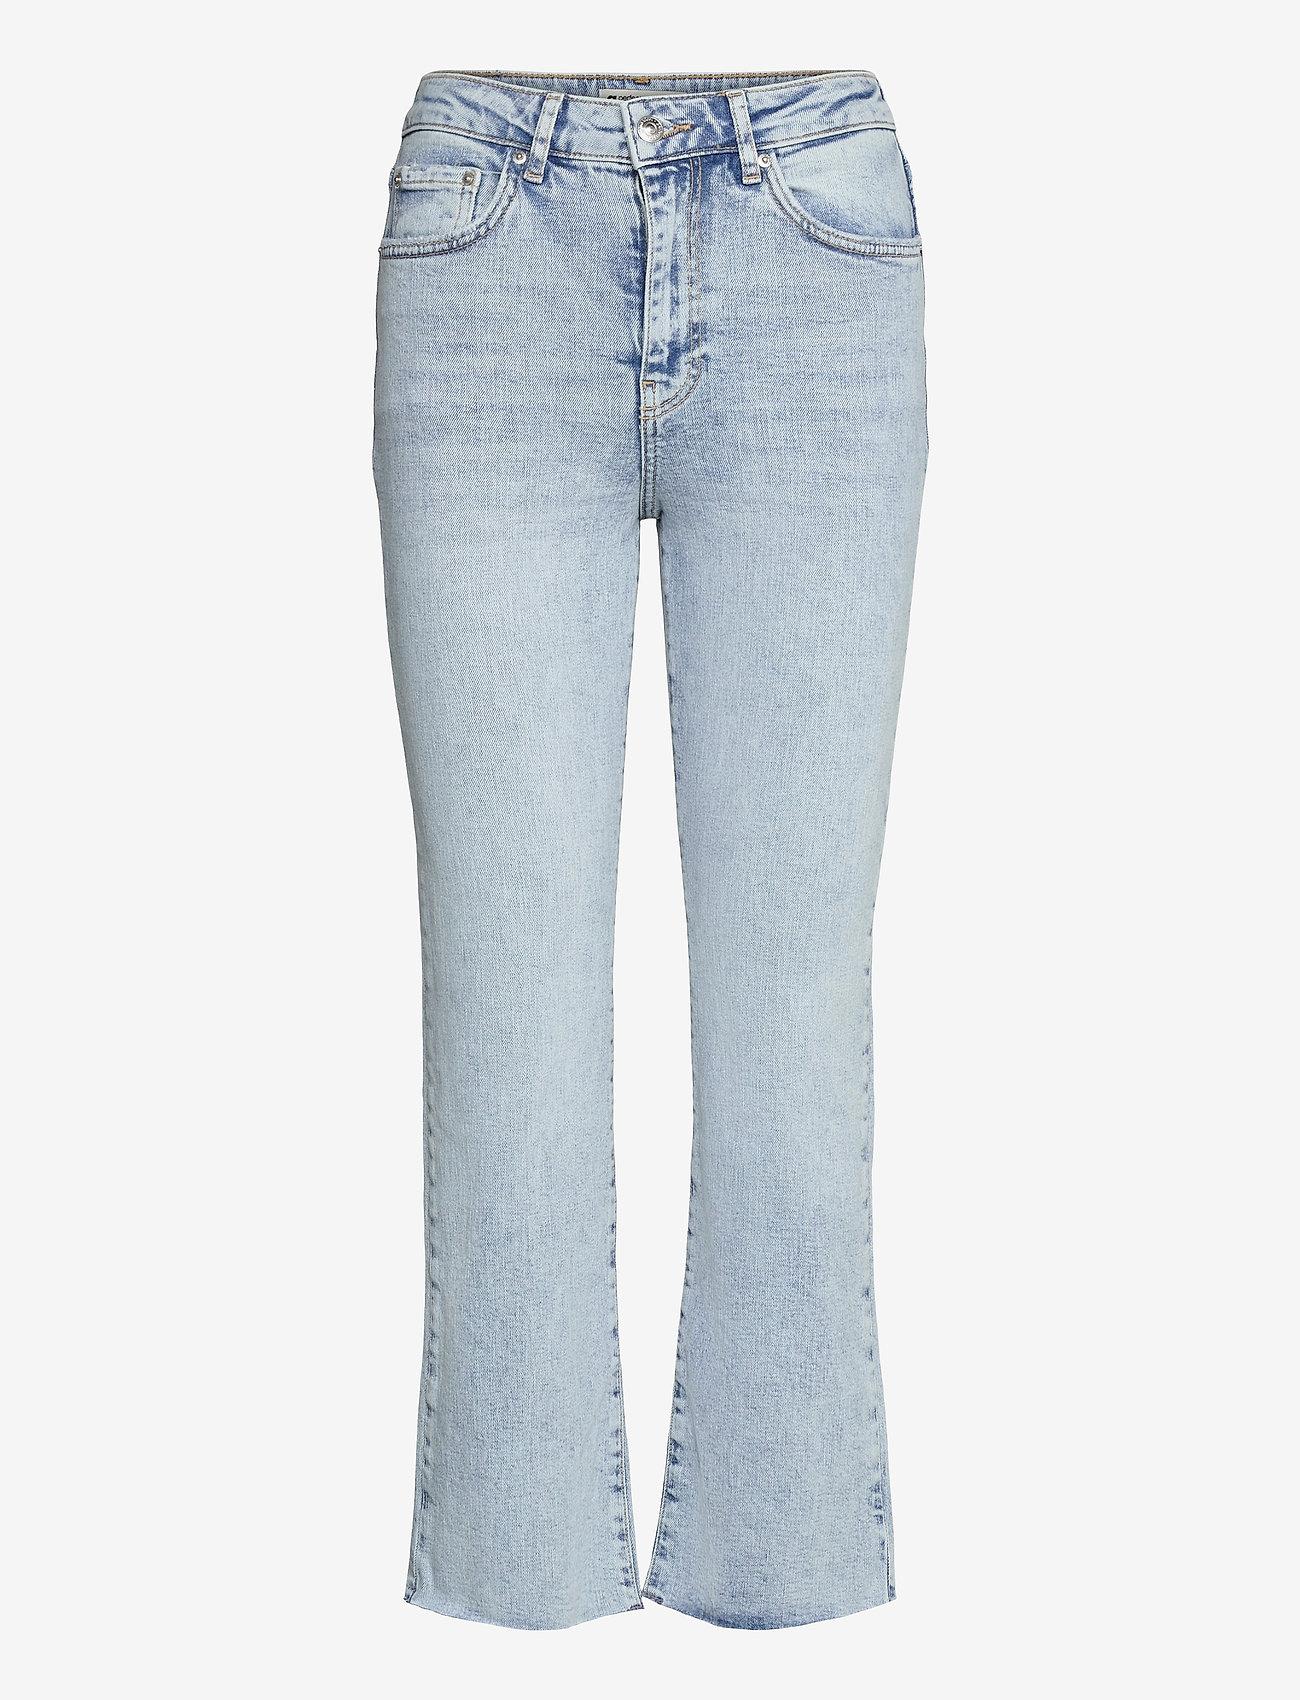 Gina Tricot - Ylva kick flare jeans - schlaghosen - sky blue - 0